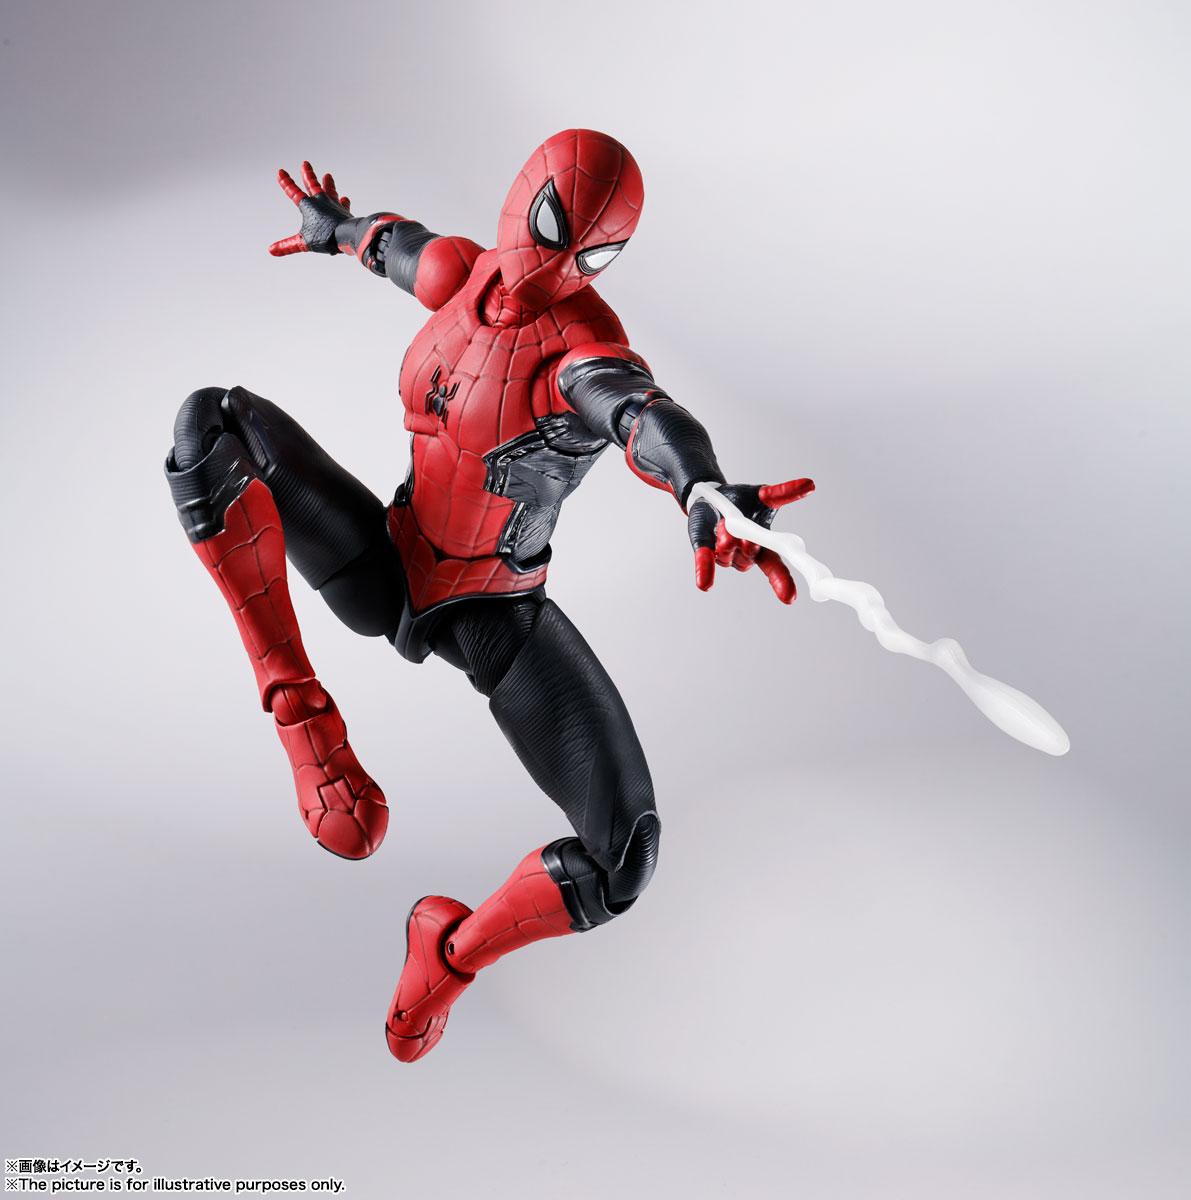 S.H.Figuarts Spider-Man: No Way Home